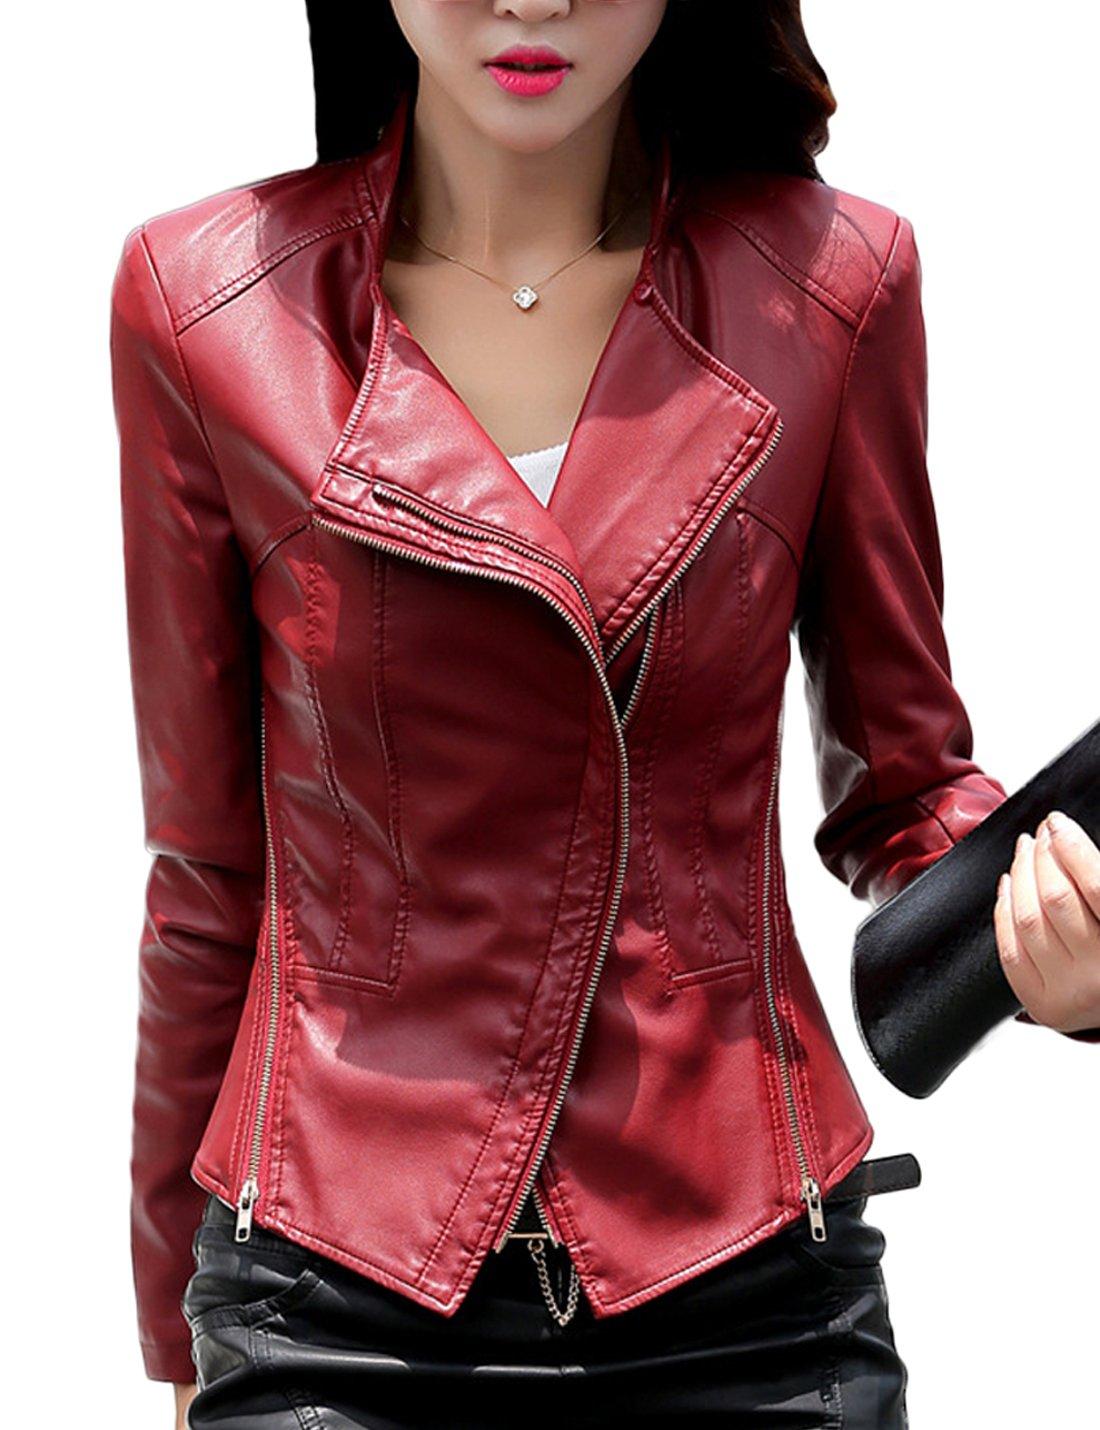 Tanming Women's Short Slim Slant Zip Faux Leather Moto Jacket Multiple Colors (Medium, Jujube red) by Tanming